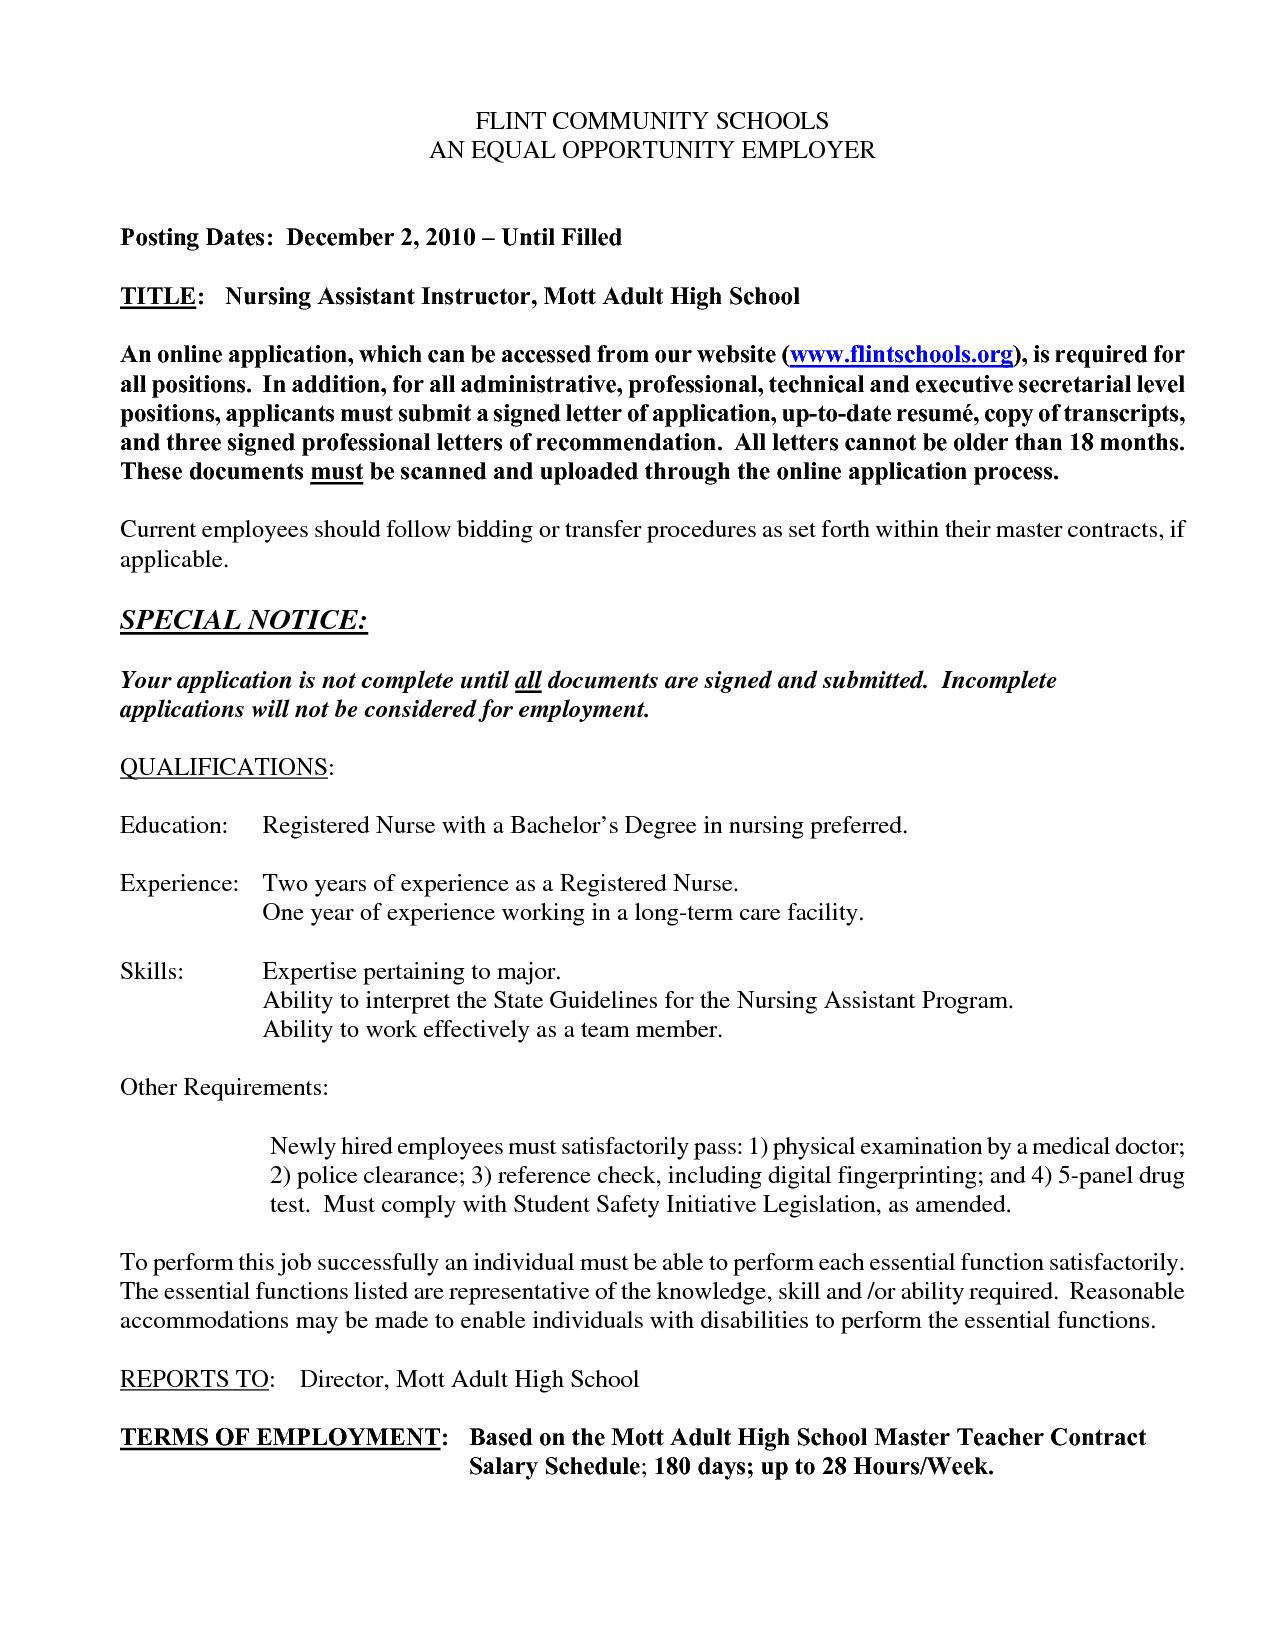 cna free resume sample nursing job certified nurse assistant cover letter carpinteria rural friedrich breakupus winsome. Resume Example. Resume CV Cover Letter